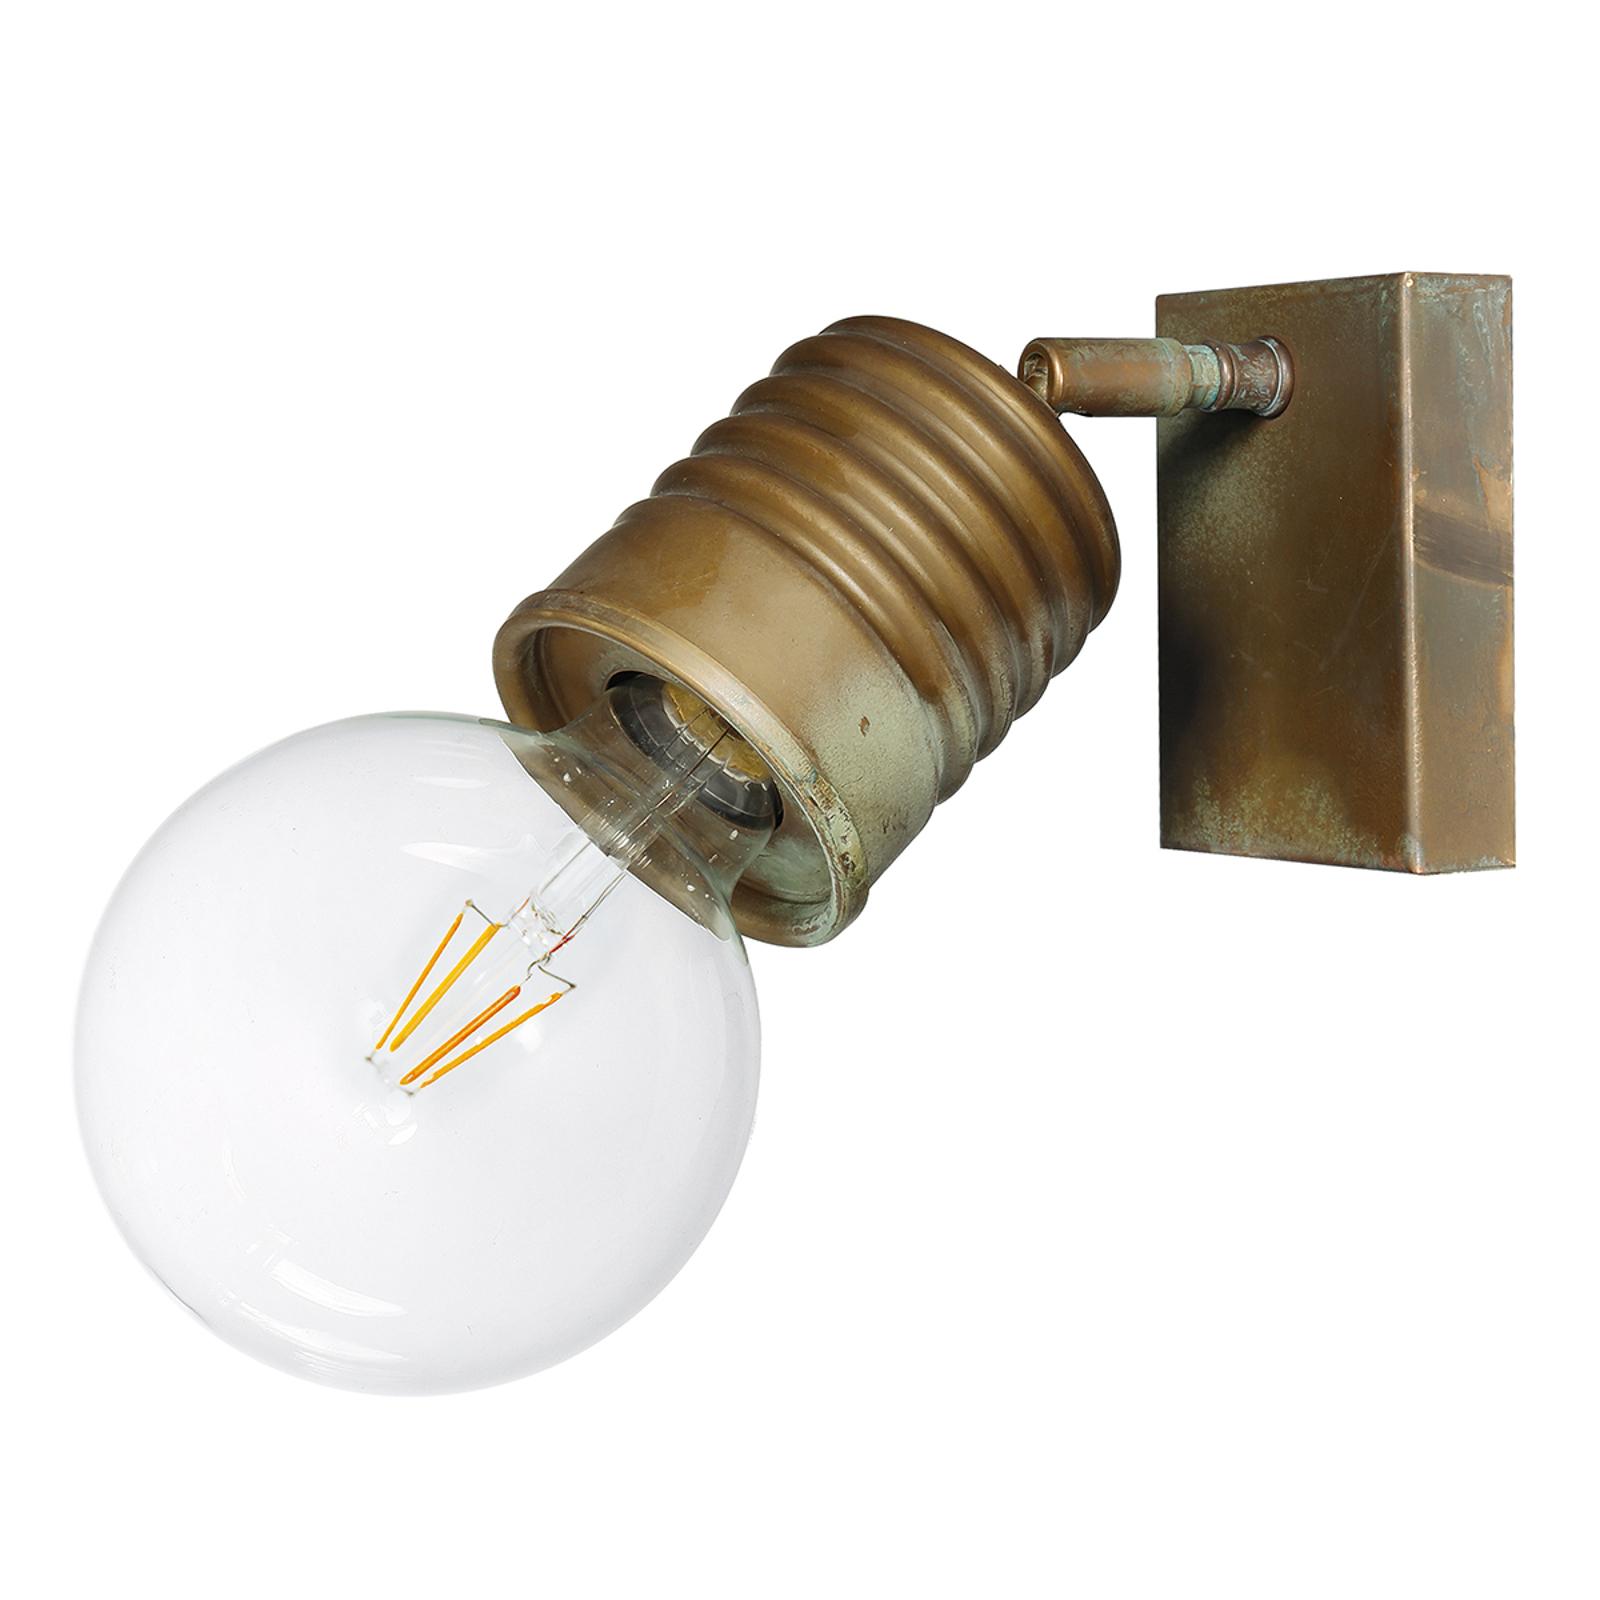 Vegglampe Orti med original design